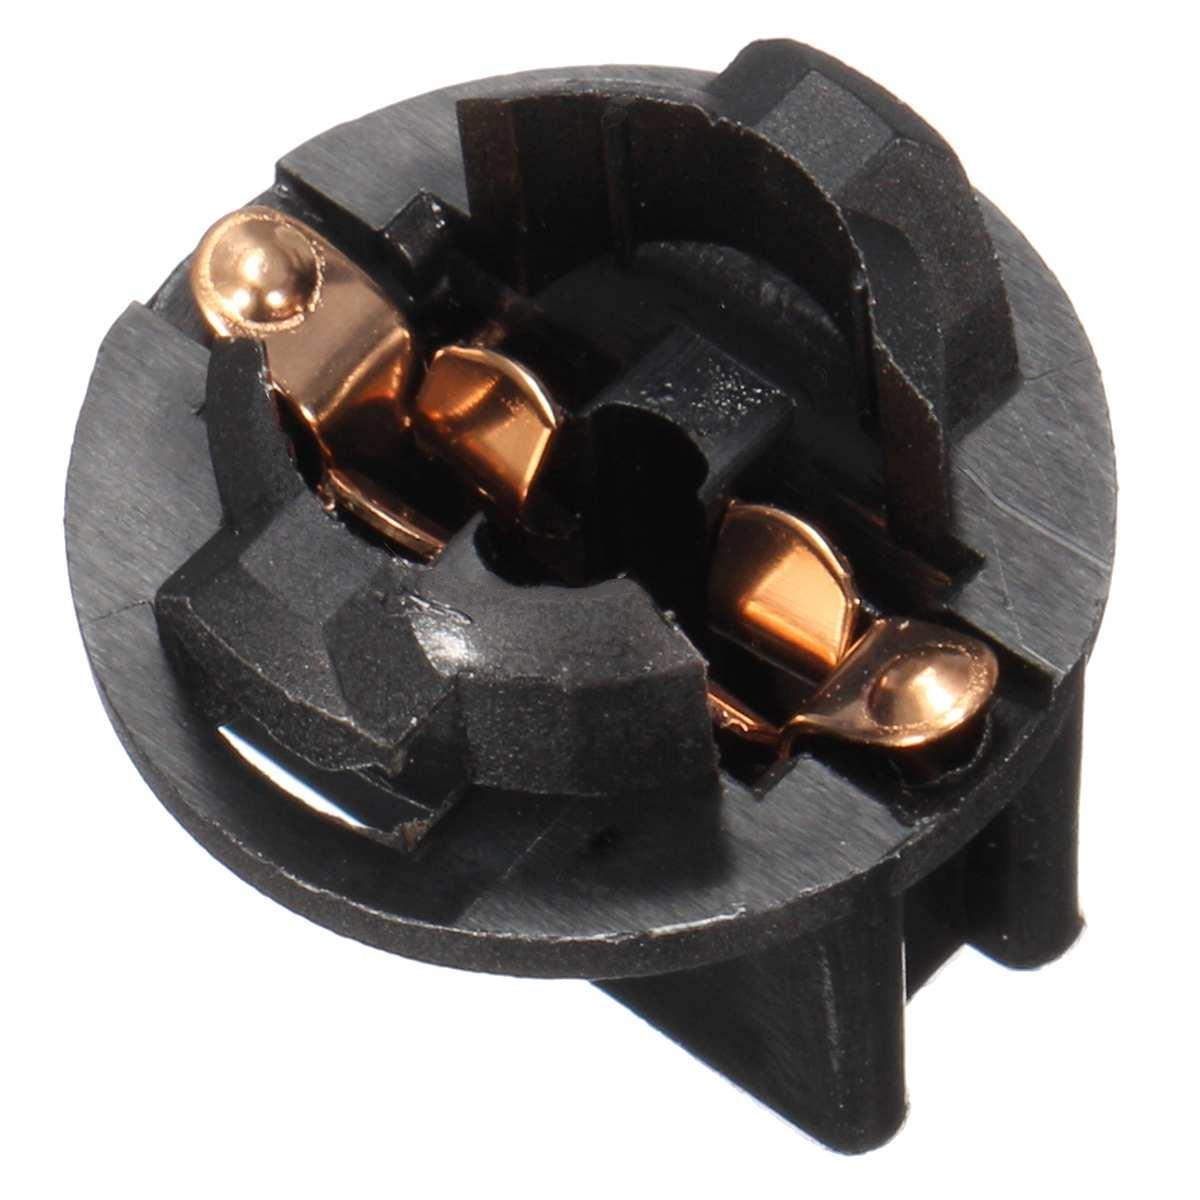 10pc 10.7mm T10 Socket Car Light Dash Twist Lock Wedge Instrument Panel Base Bulb Socket Plug Lamp Holder Black